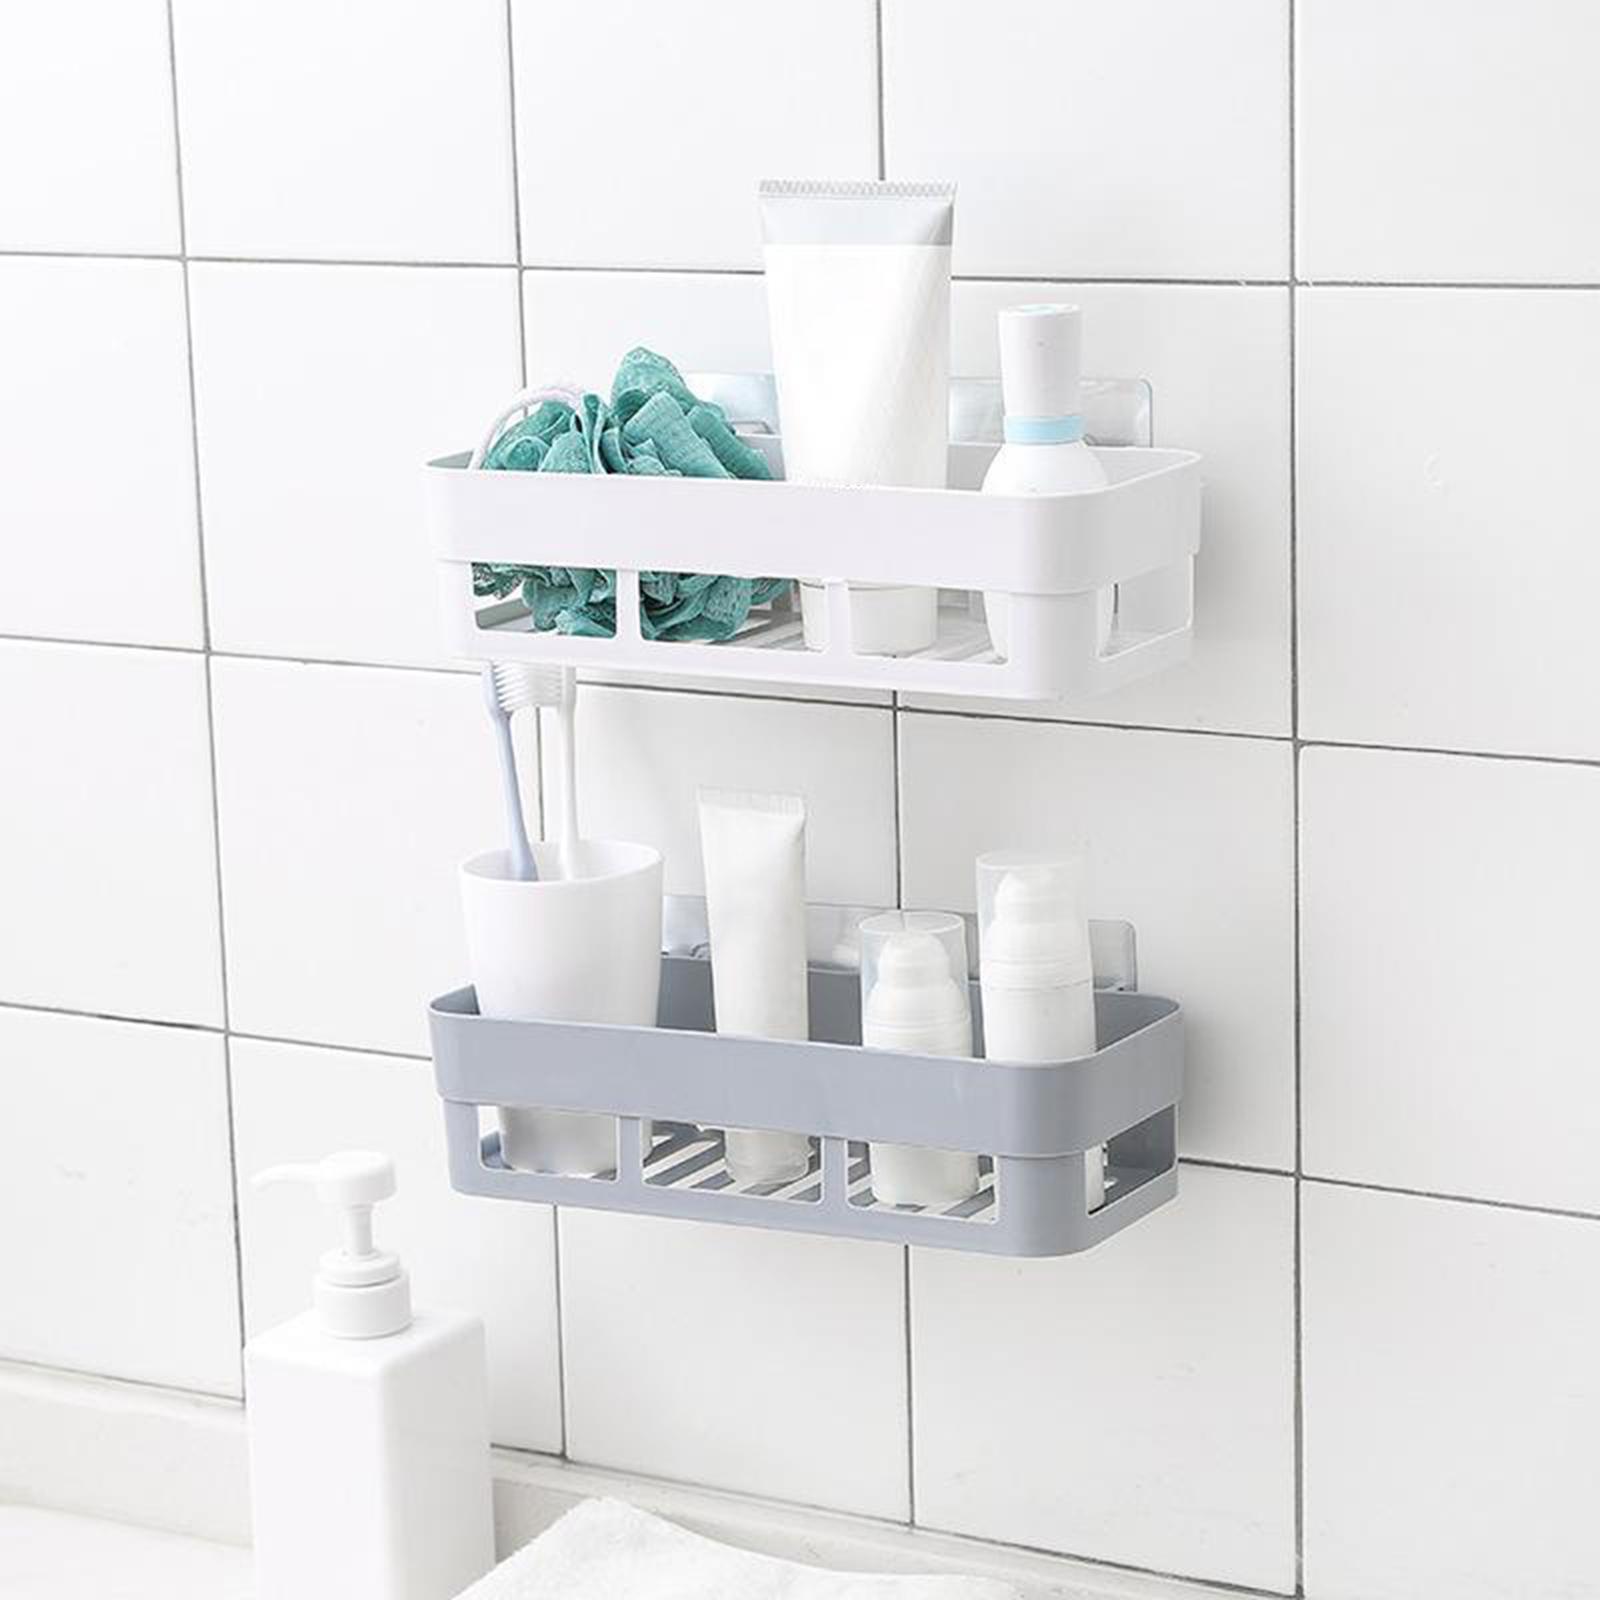 thumbnail 7 - Wall-Suction-Bathroom-Shelf-Shower-Caddy-Wall-Mount-Storage-Rack-Organizer